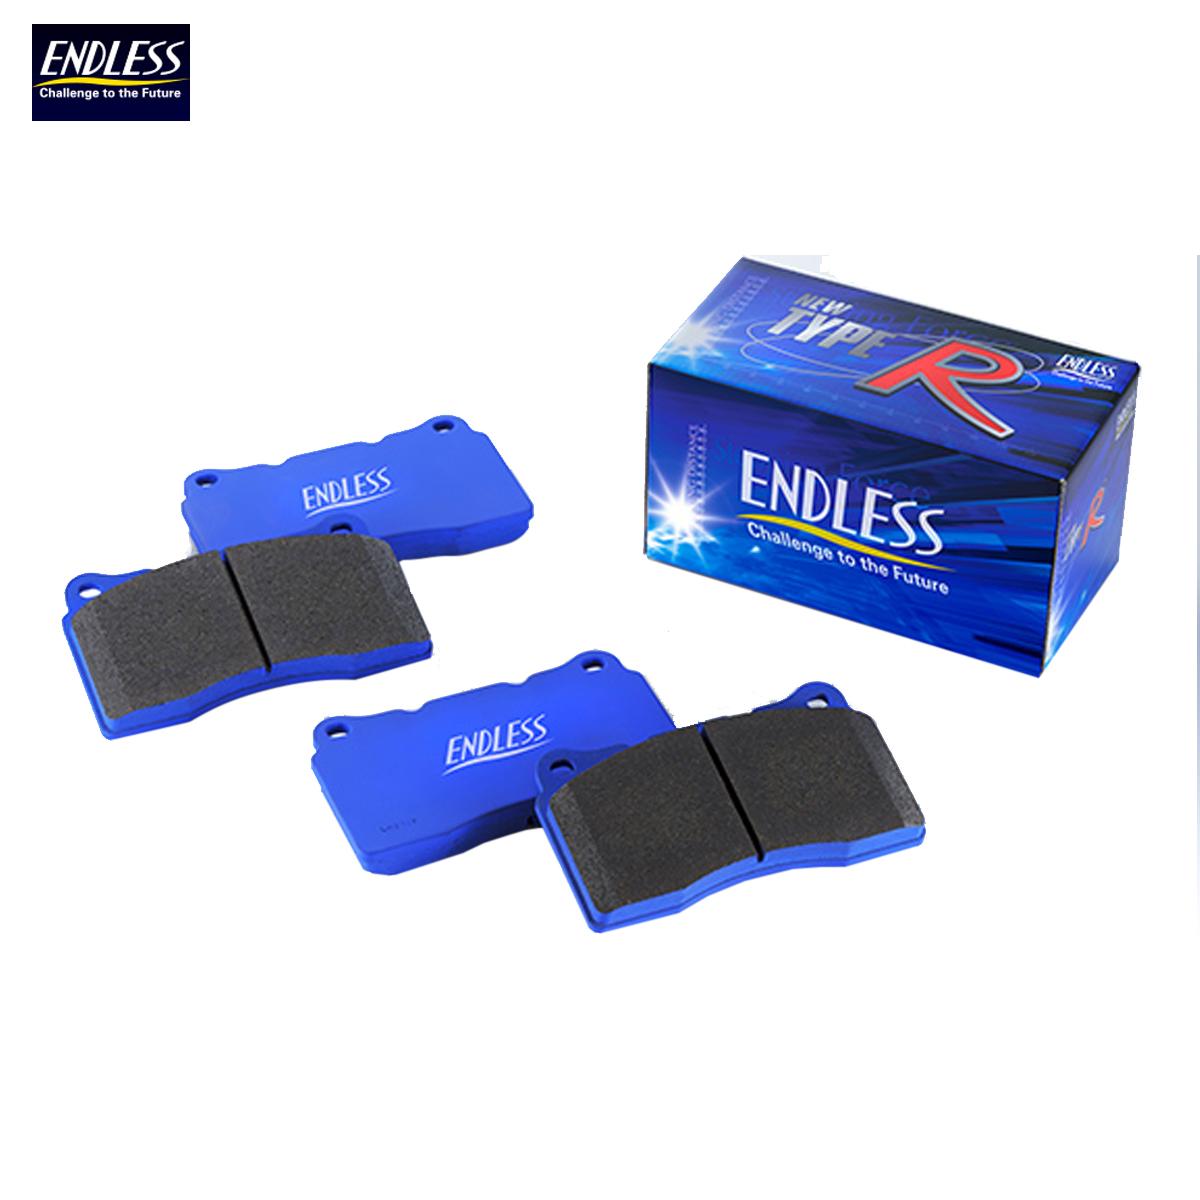 ENDLESS エンドレス ブレーキパッド タイプR リア EP354 ヴェロッサ JZX110 (NA) GX110